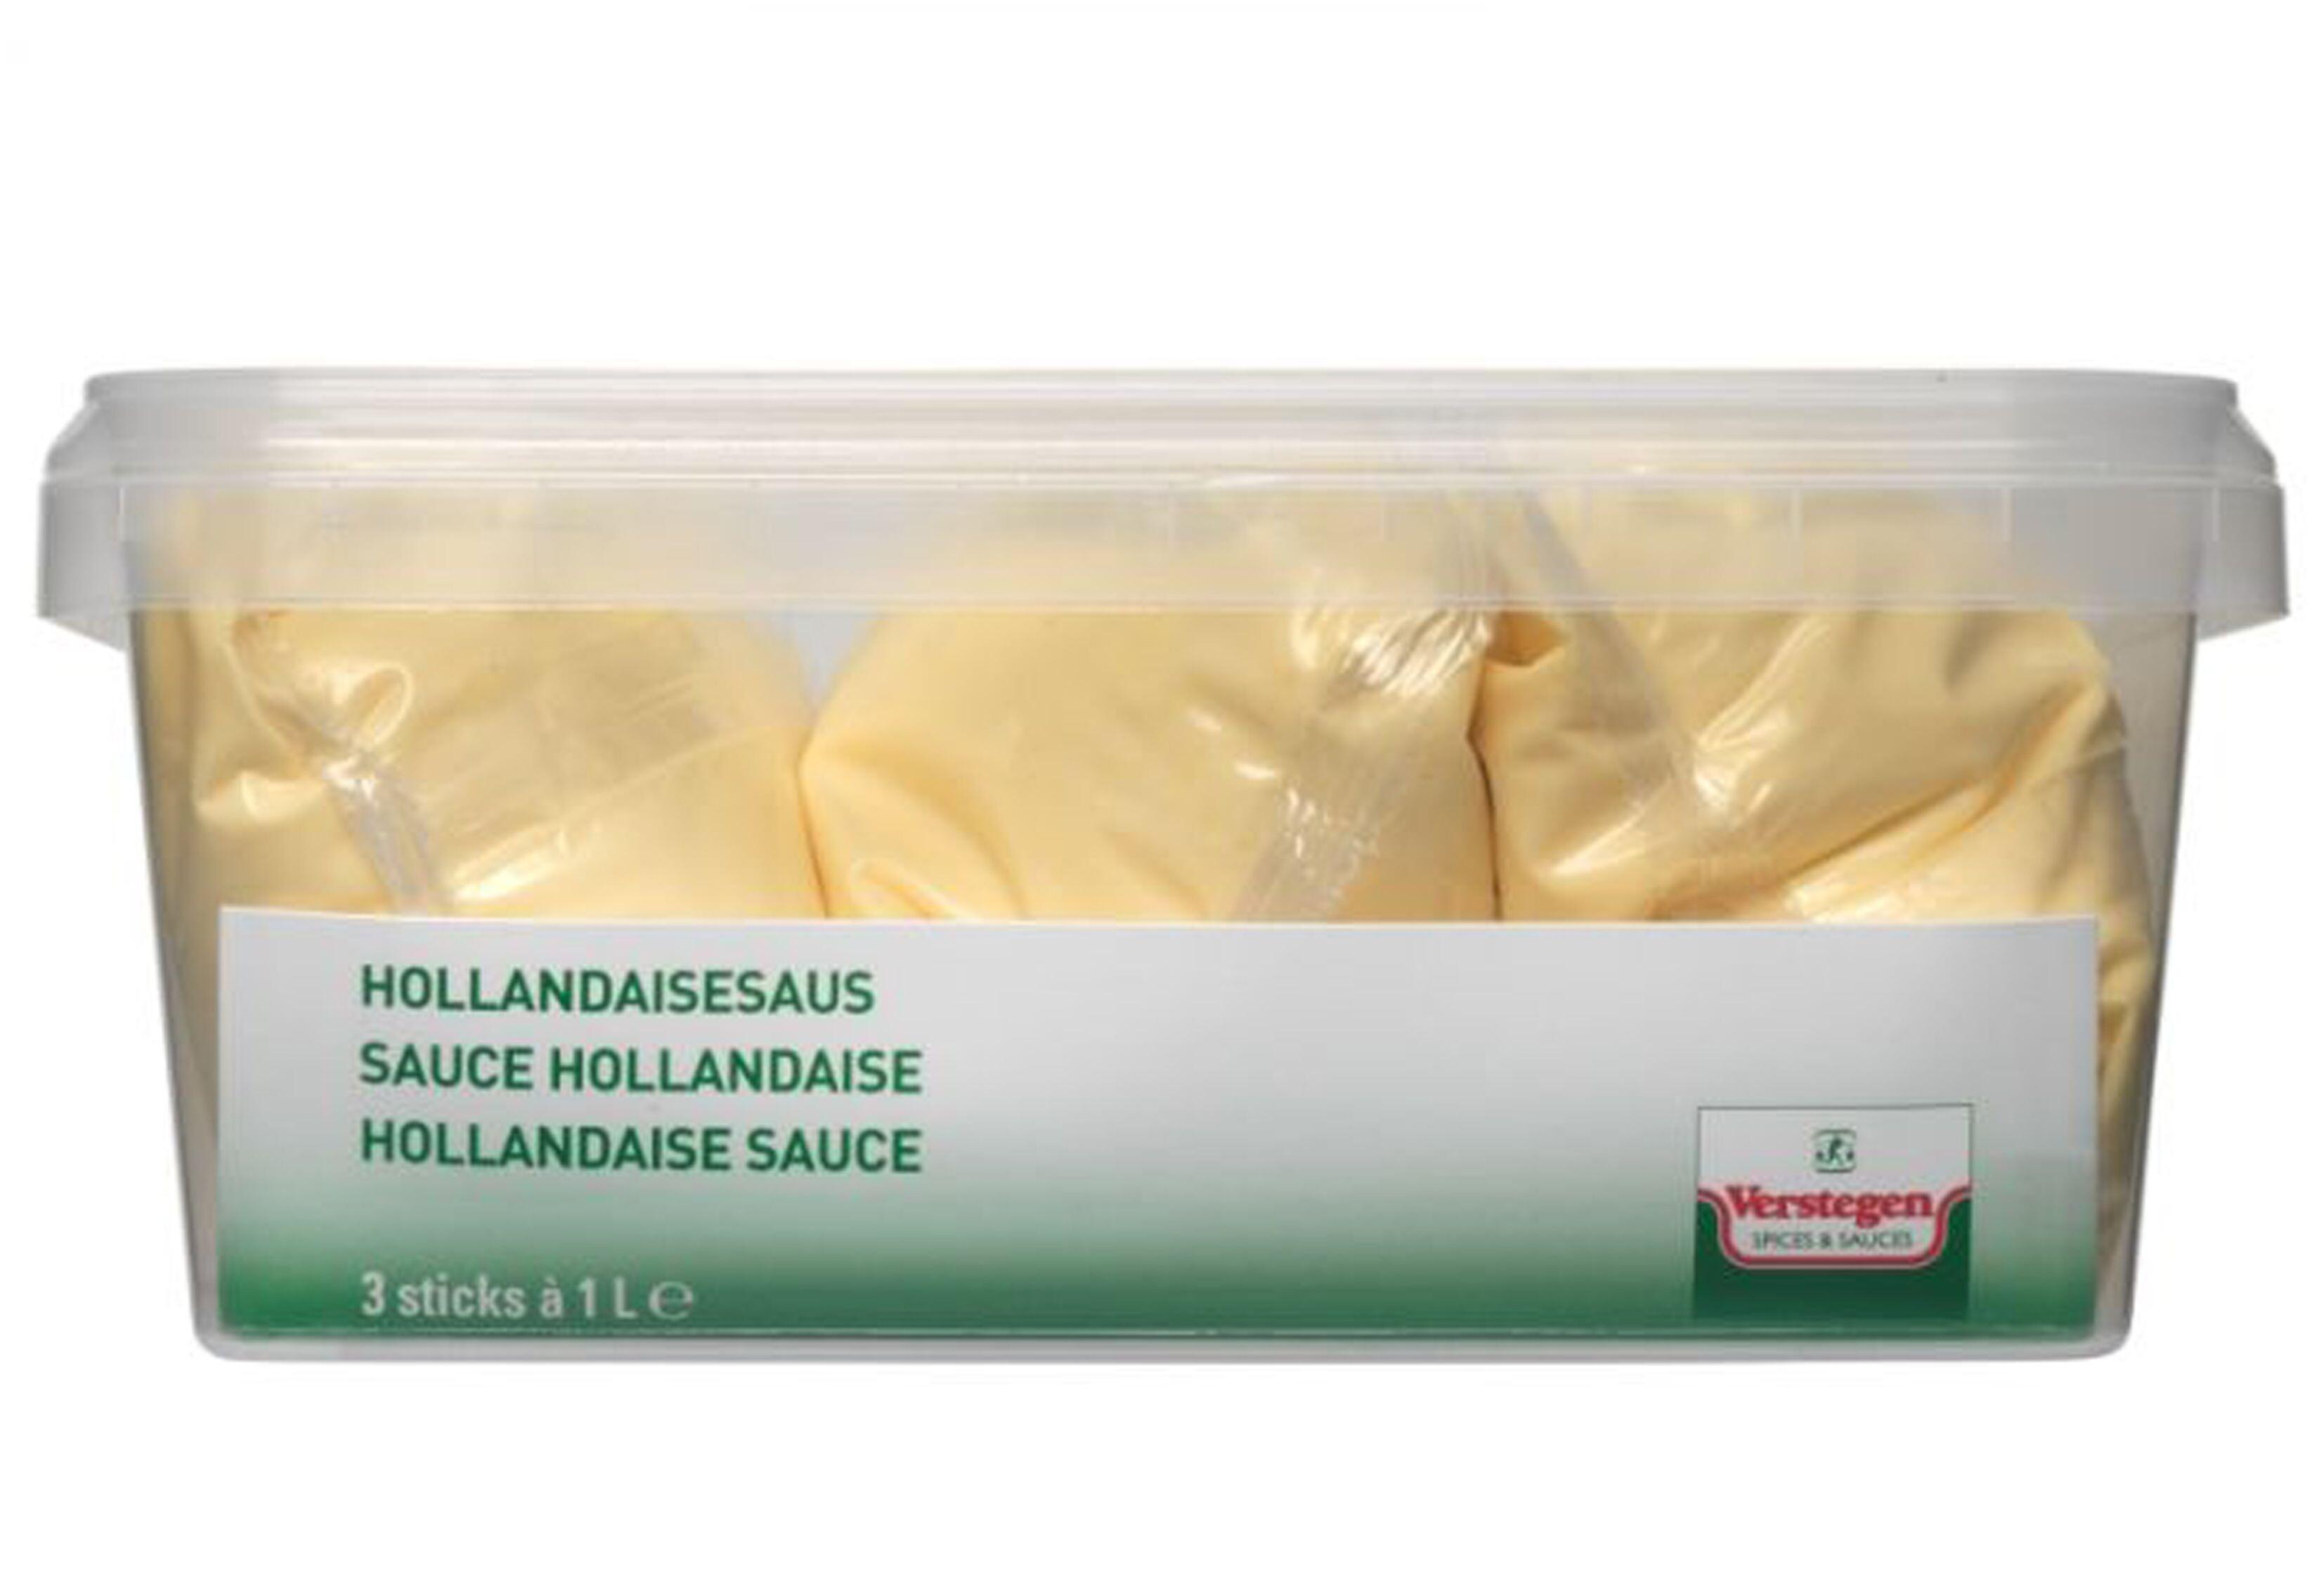 Verstegen hollandaise liquid sauce Warm Up 3x1L